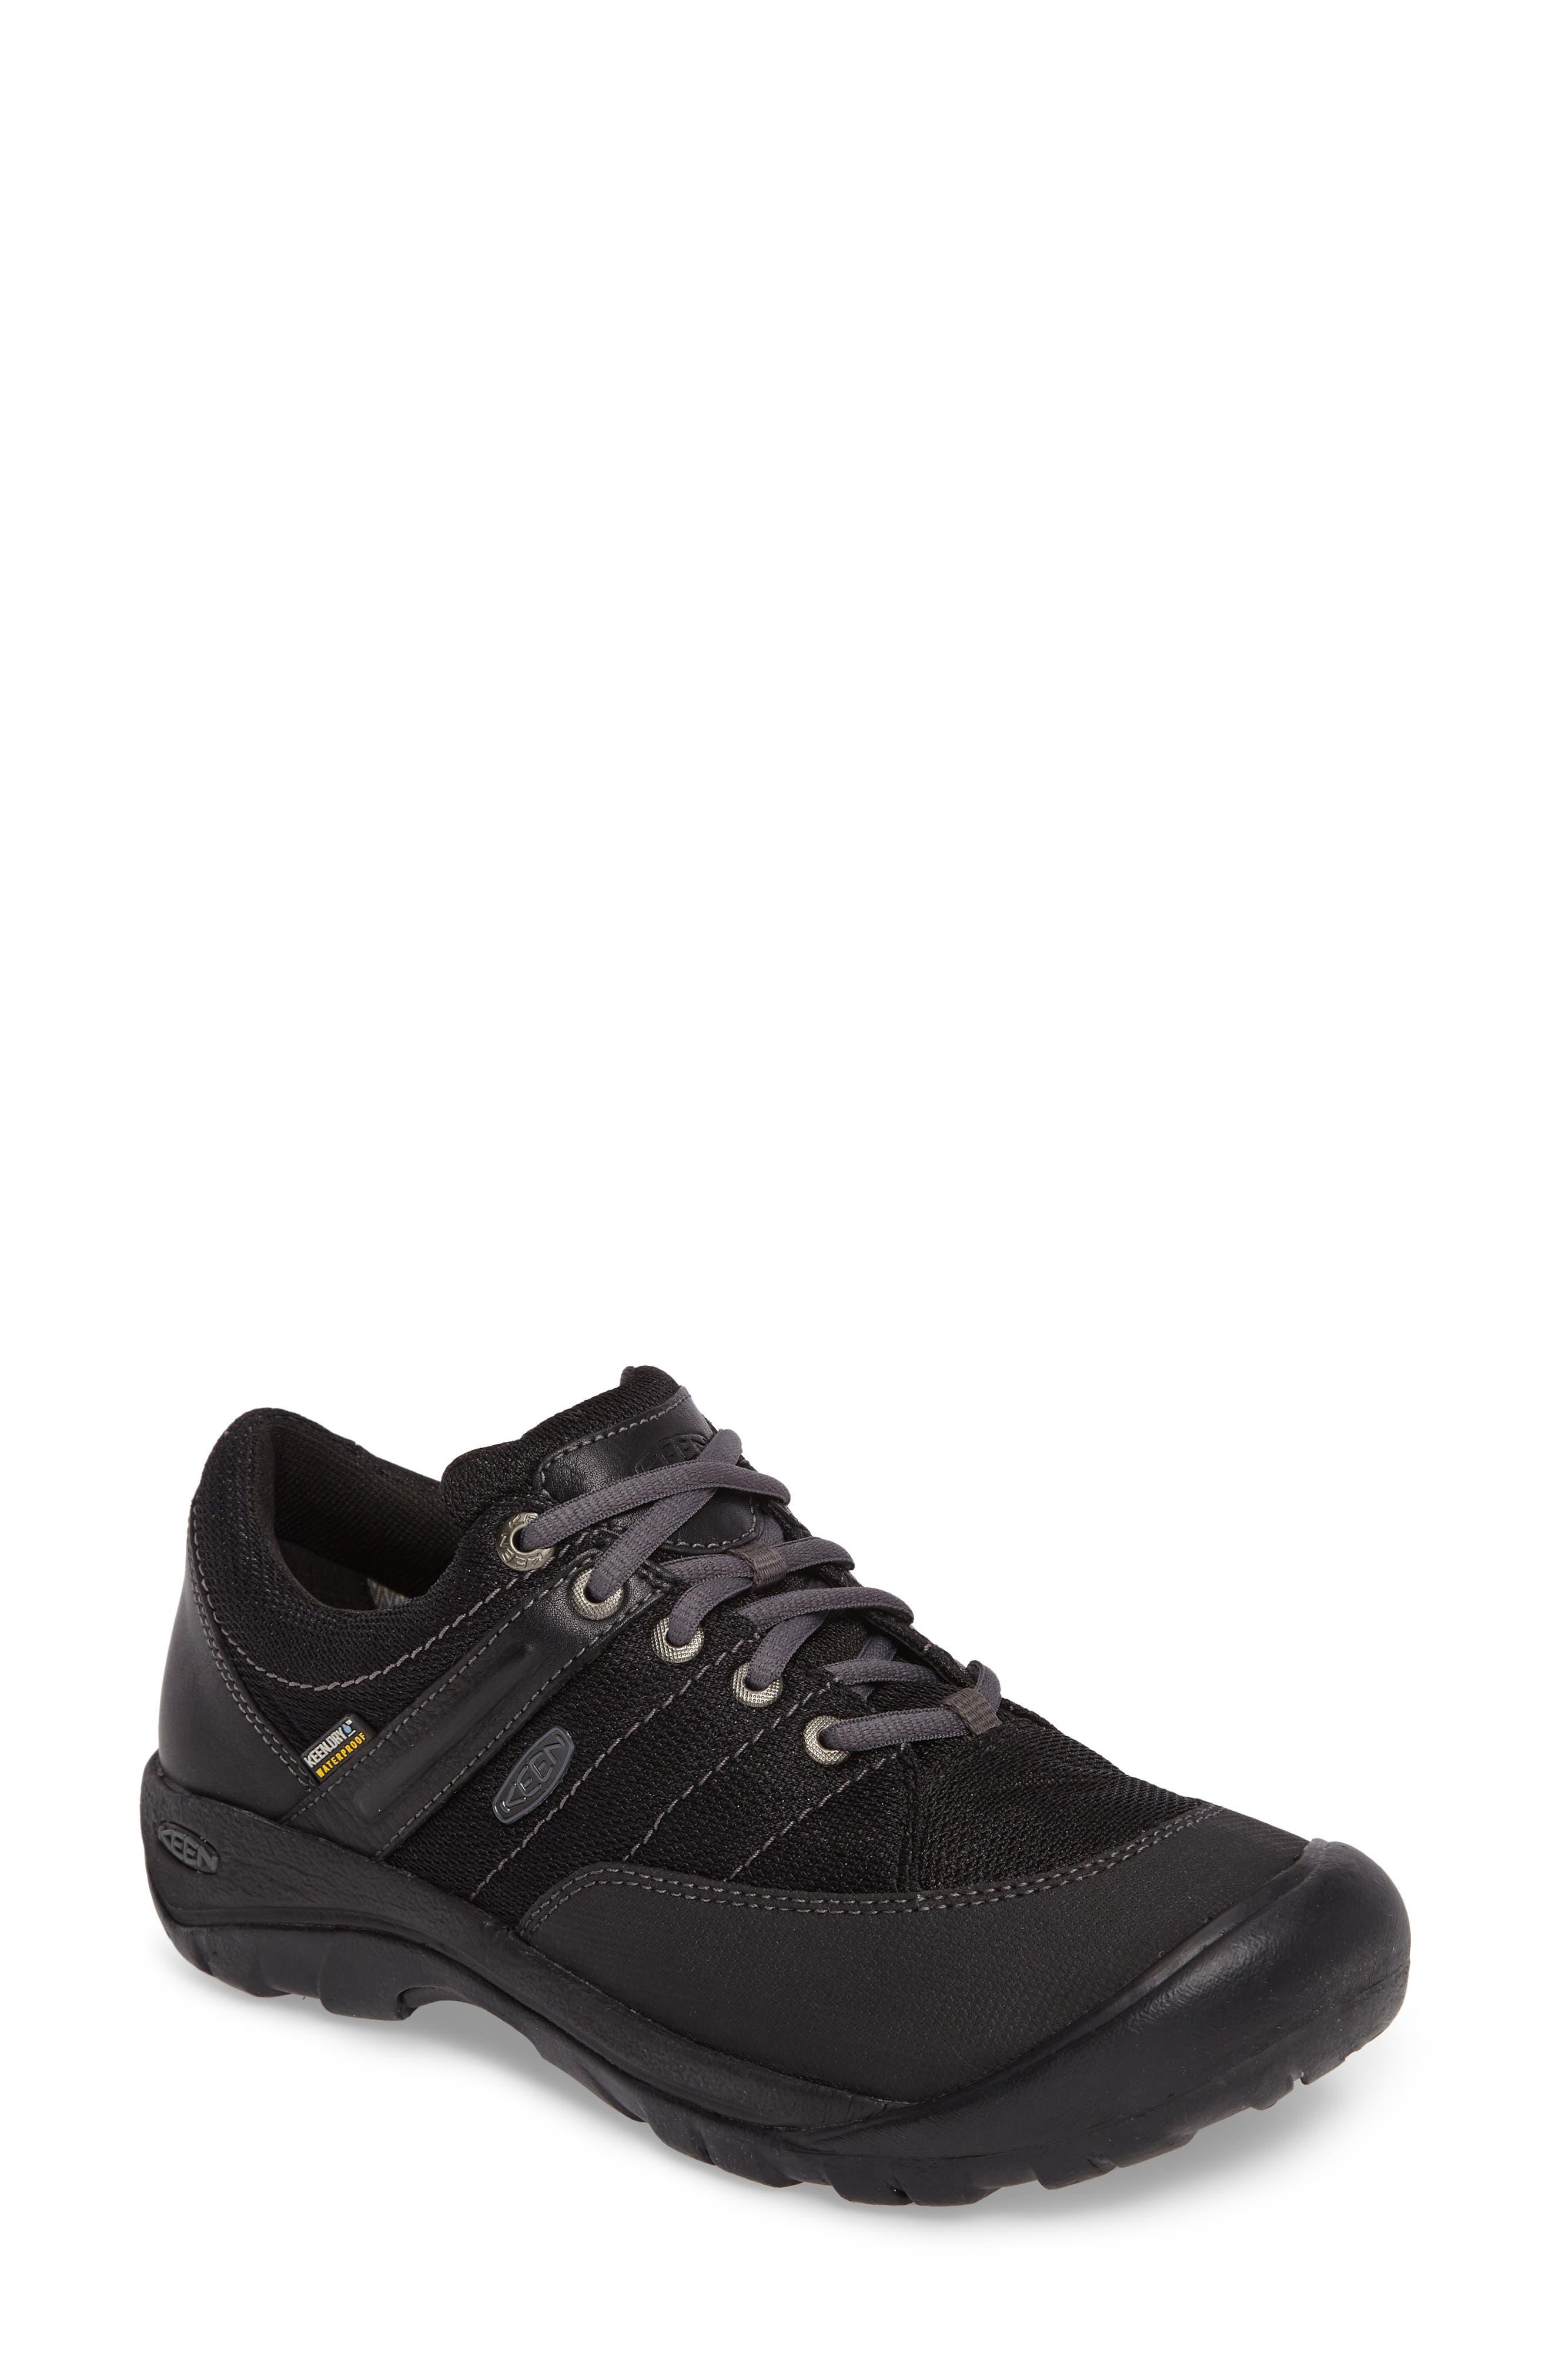 Presidio Waterproof Sport Sneaker,                         Main,                         color, BLACK LEATHER